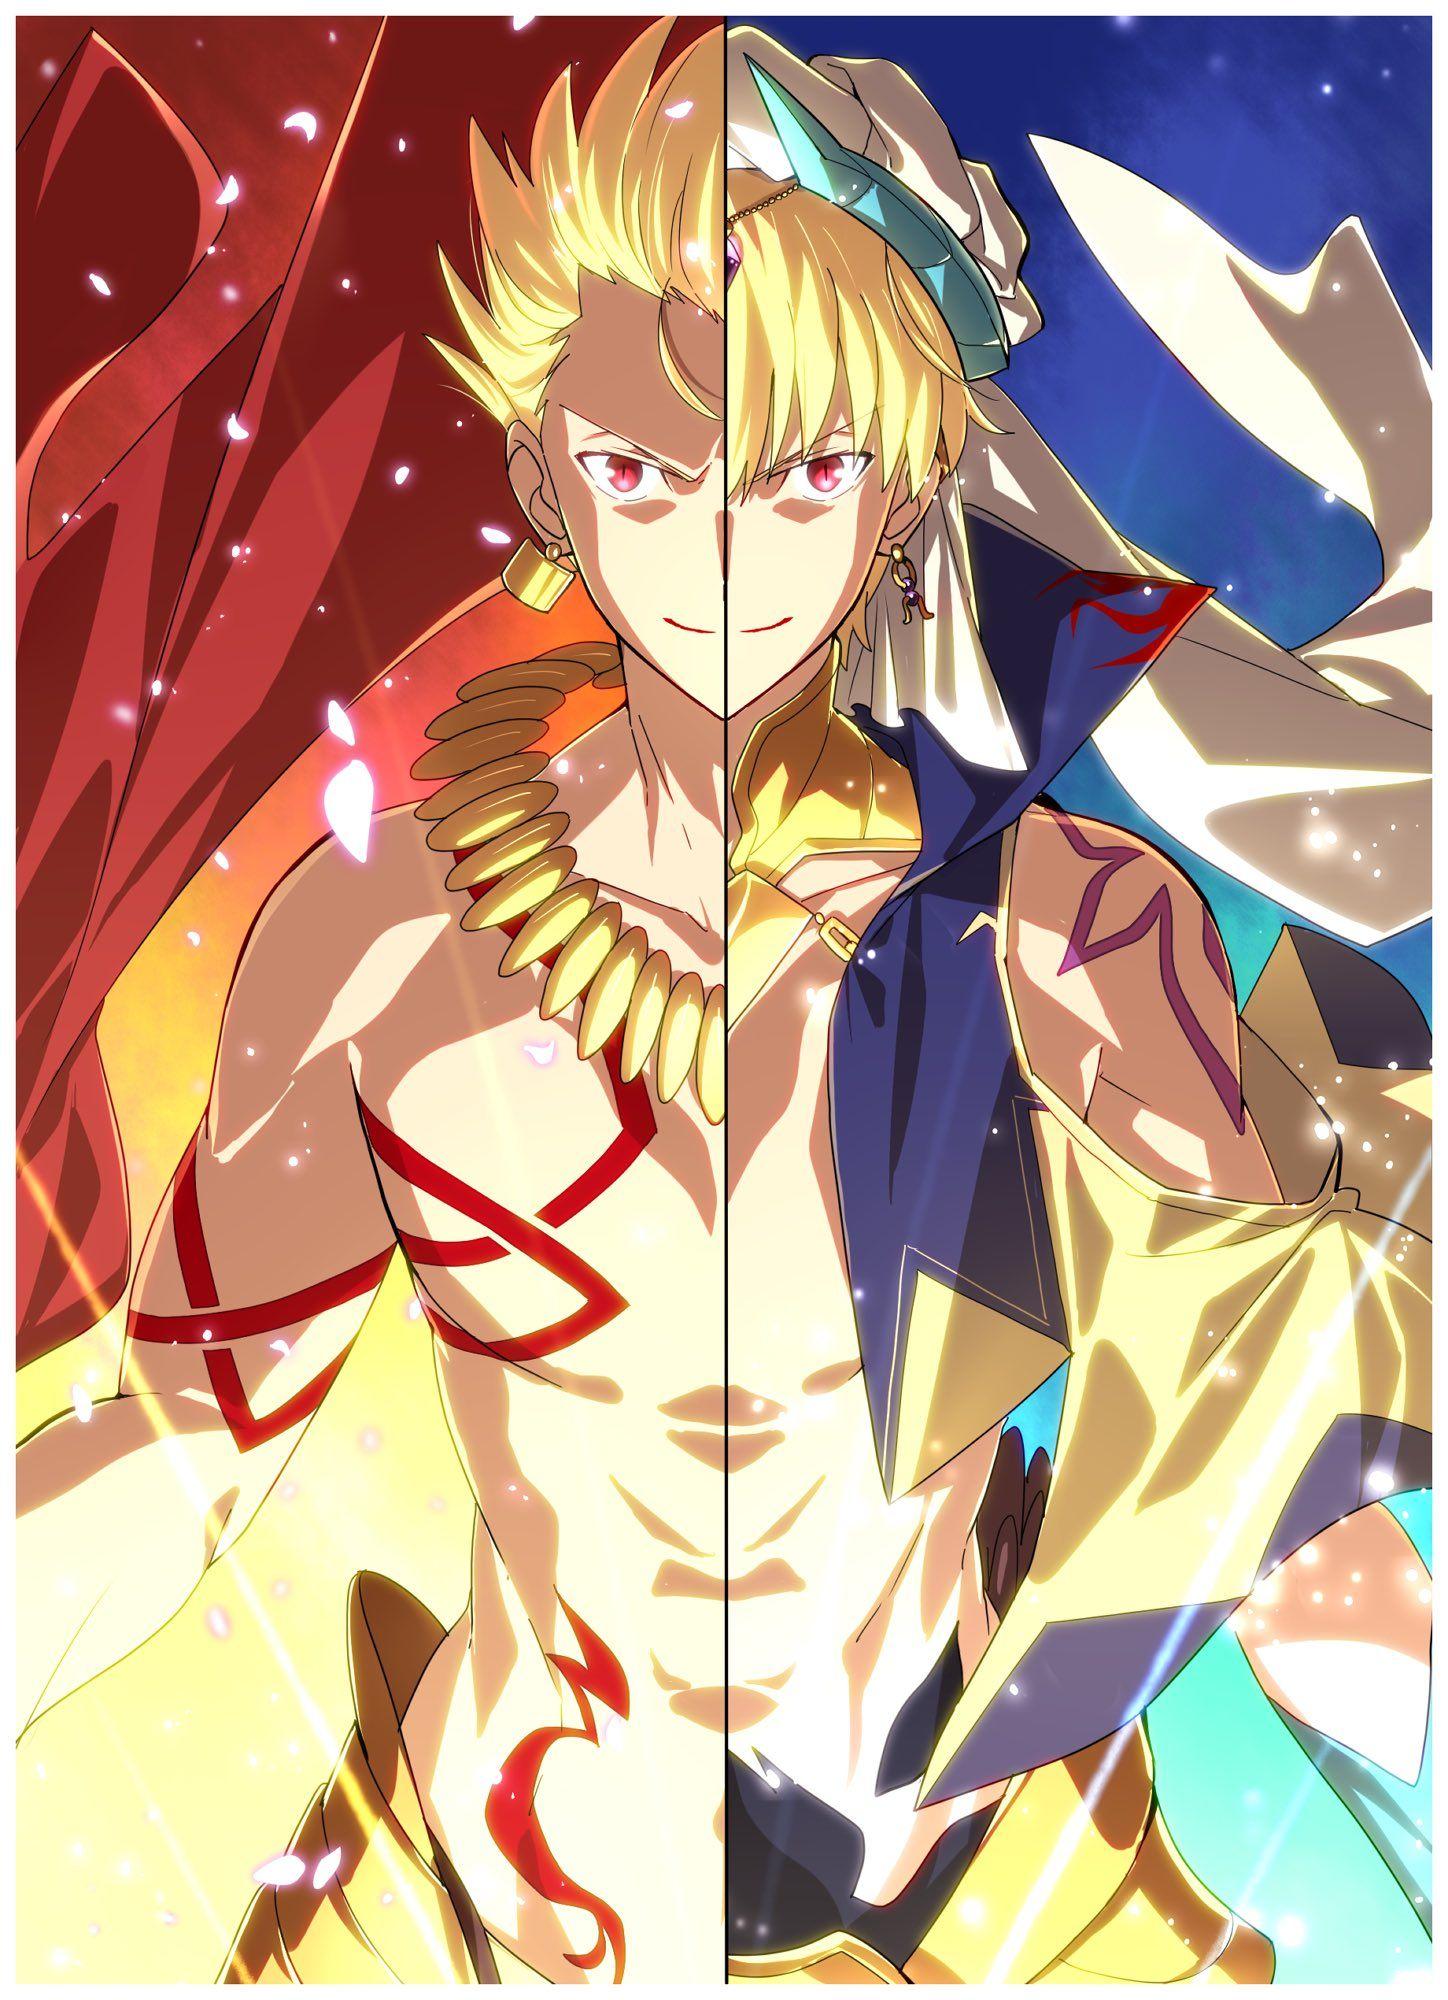 Twitter in 2020 Fate anime series, King gilgamesh